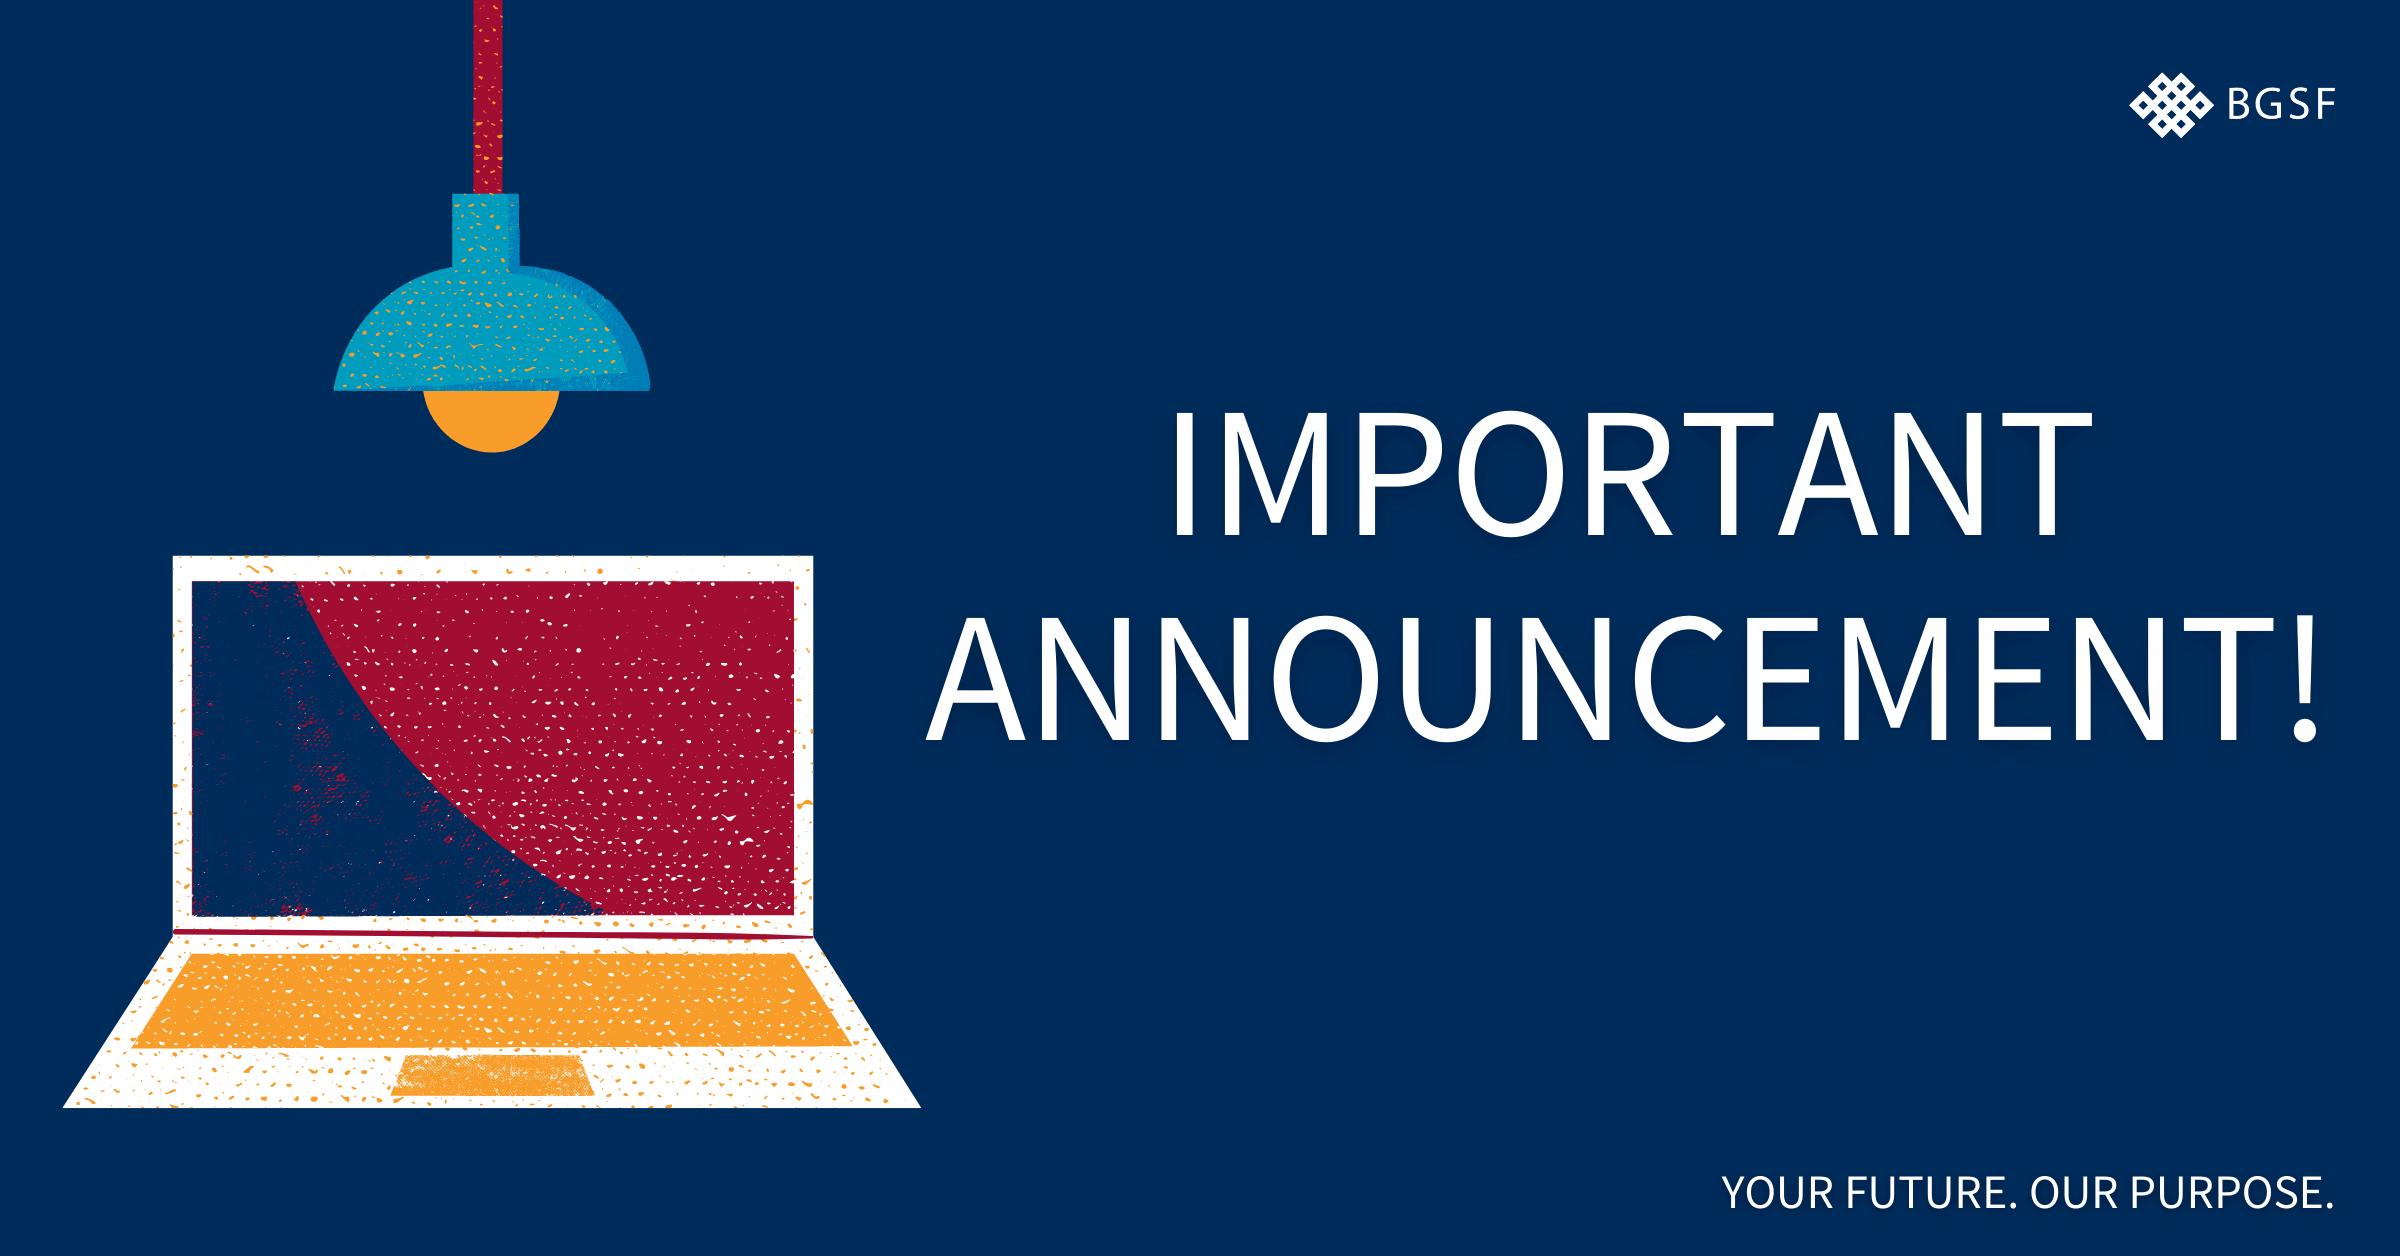 BGSF Community Announcement